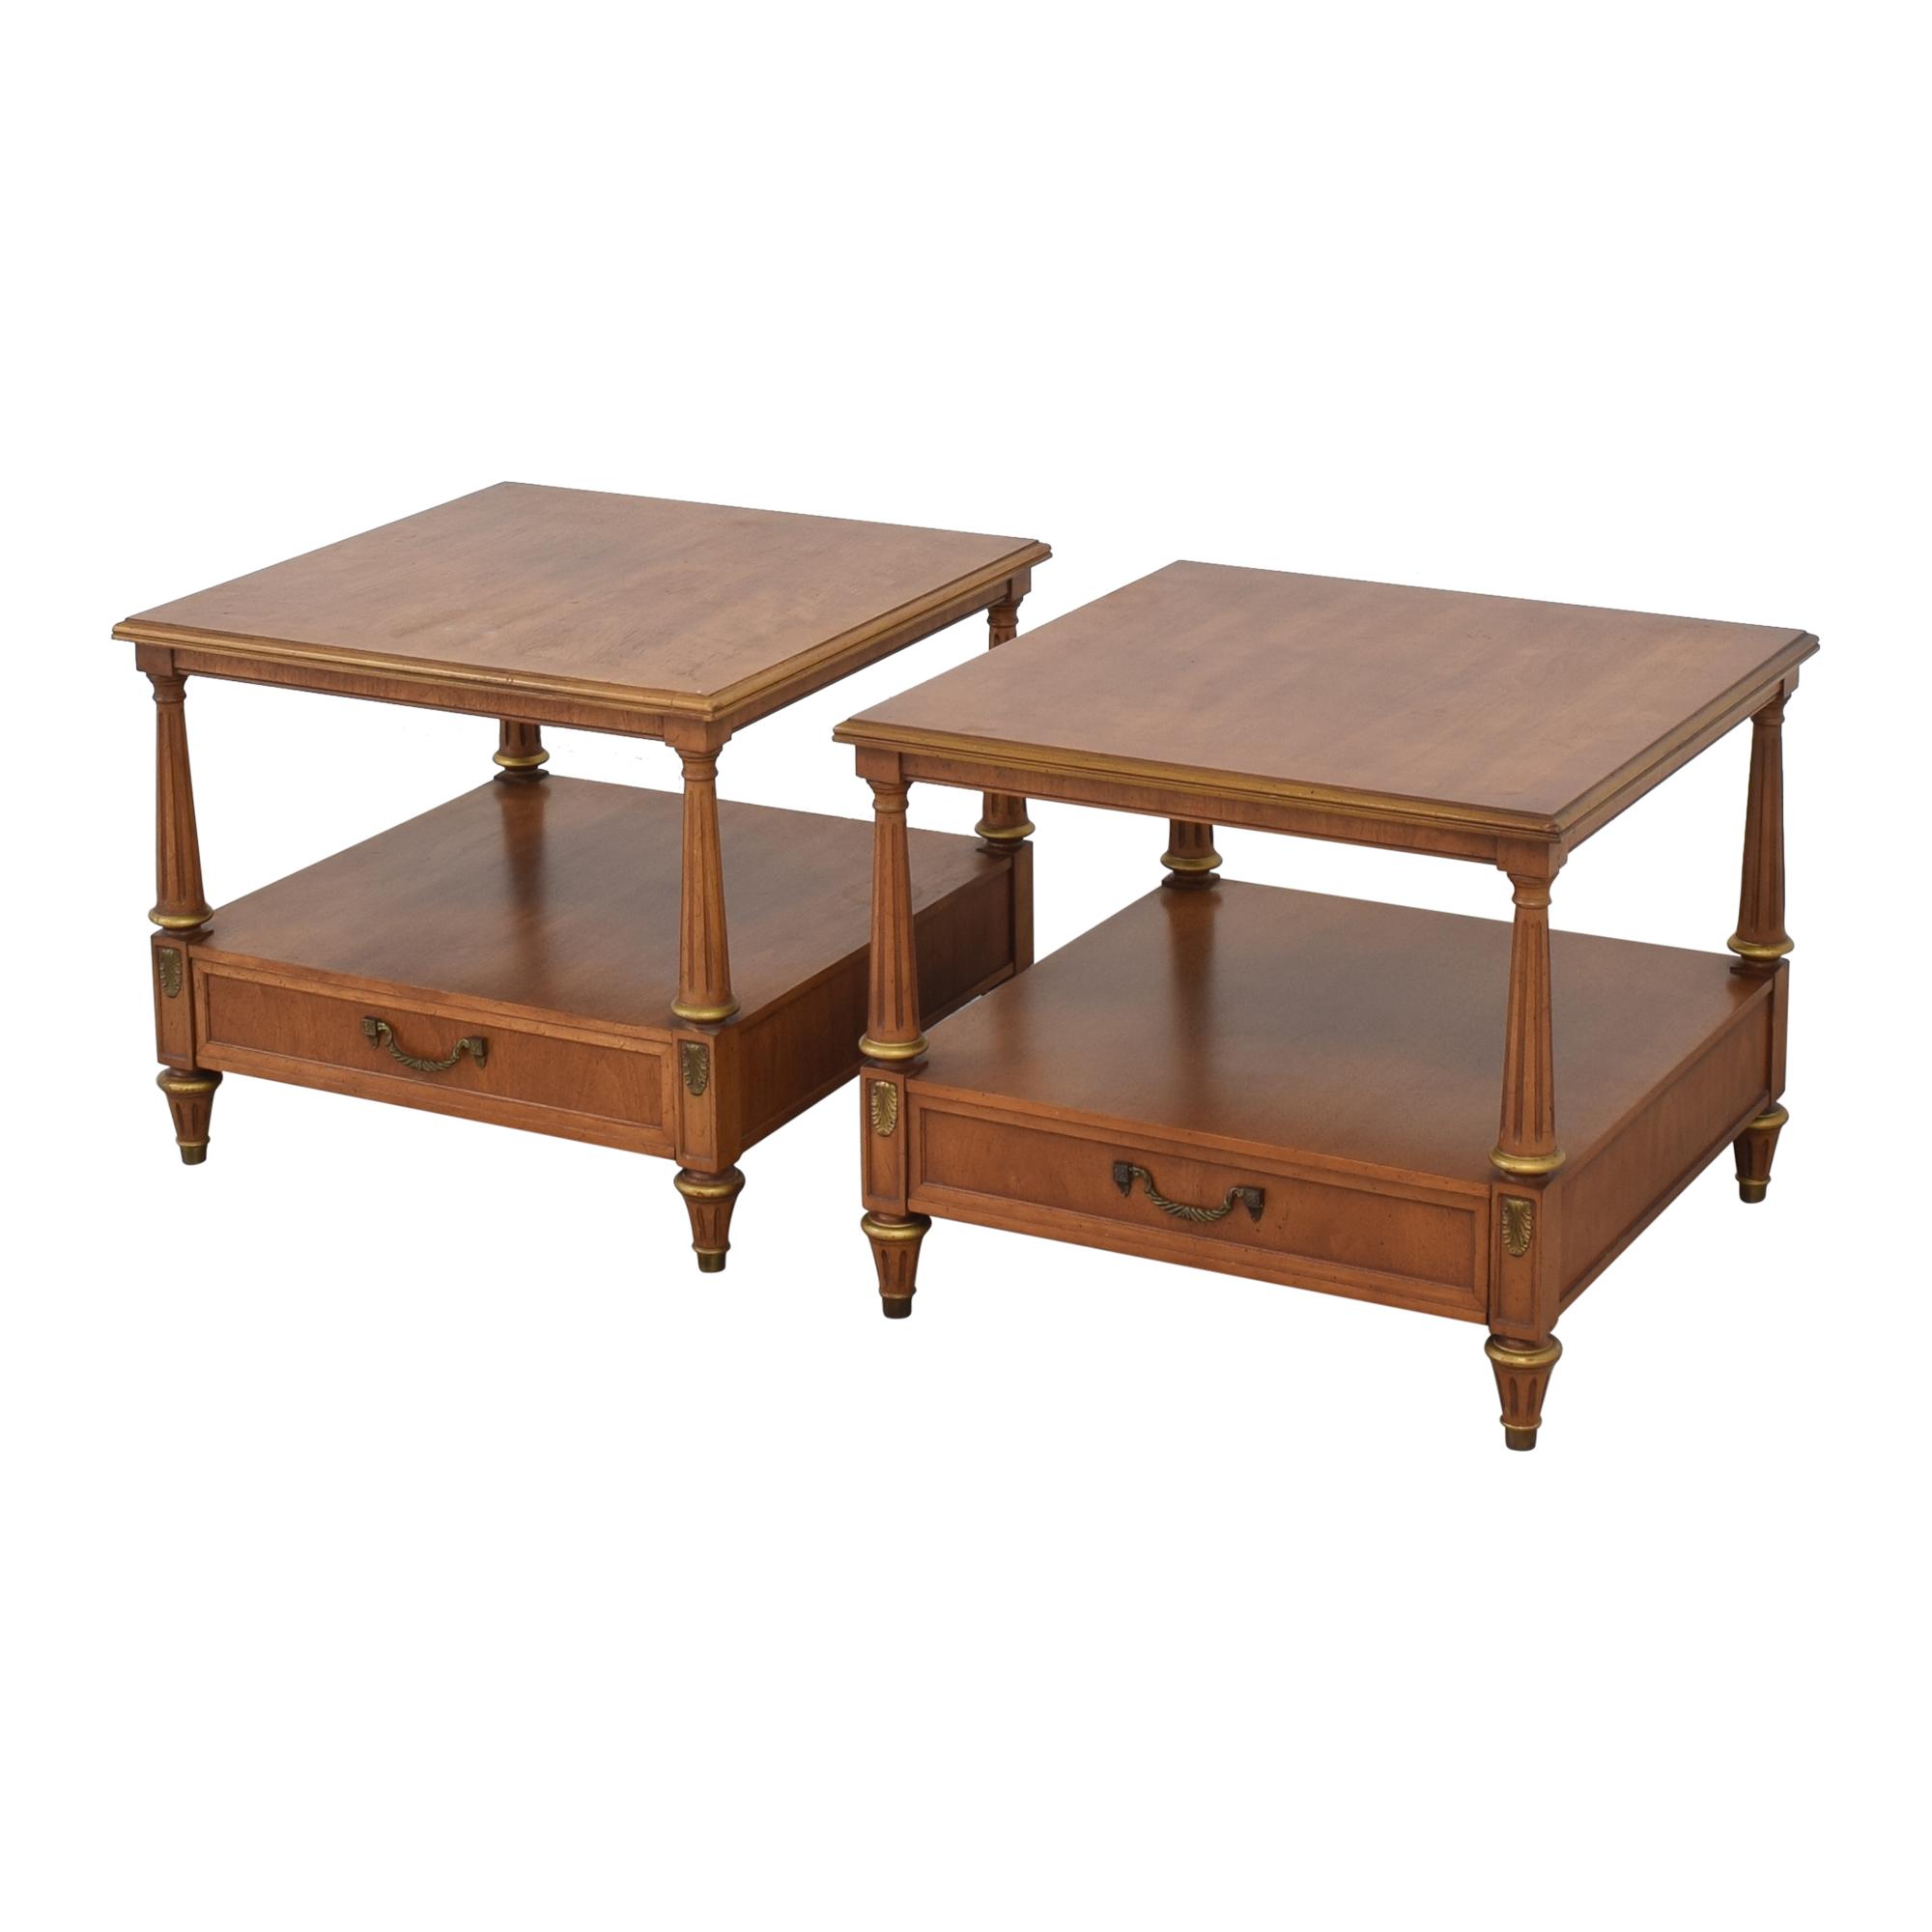 Henredon Two Tier End Tables Henredon Furniture